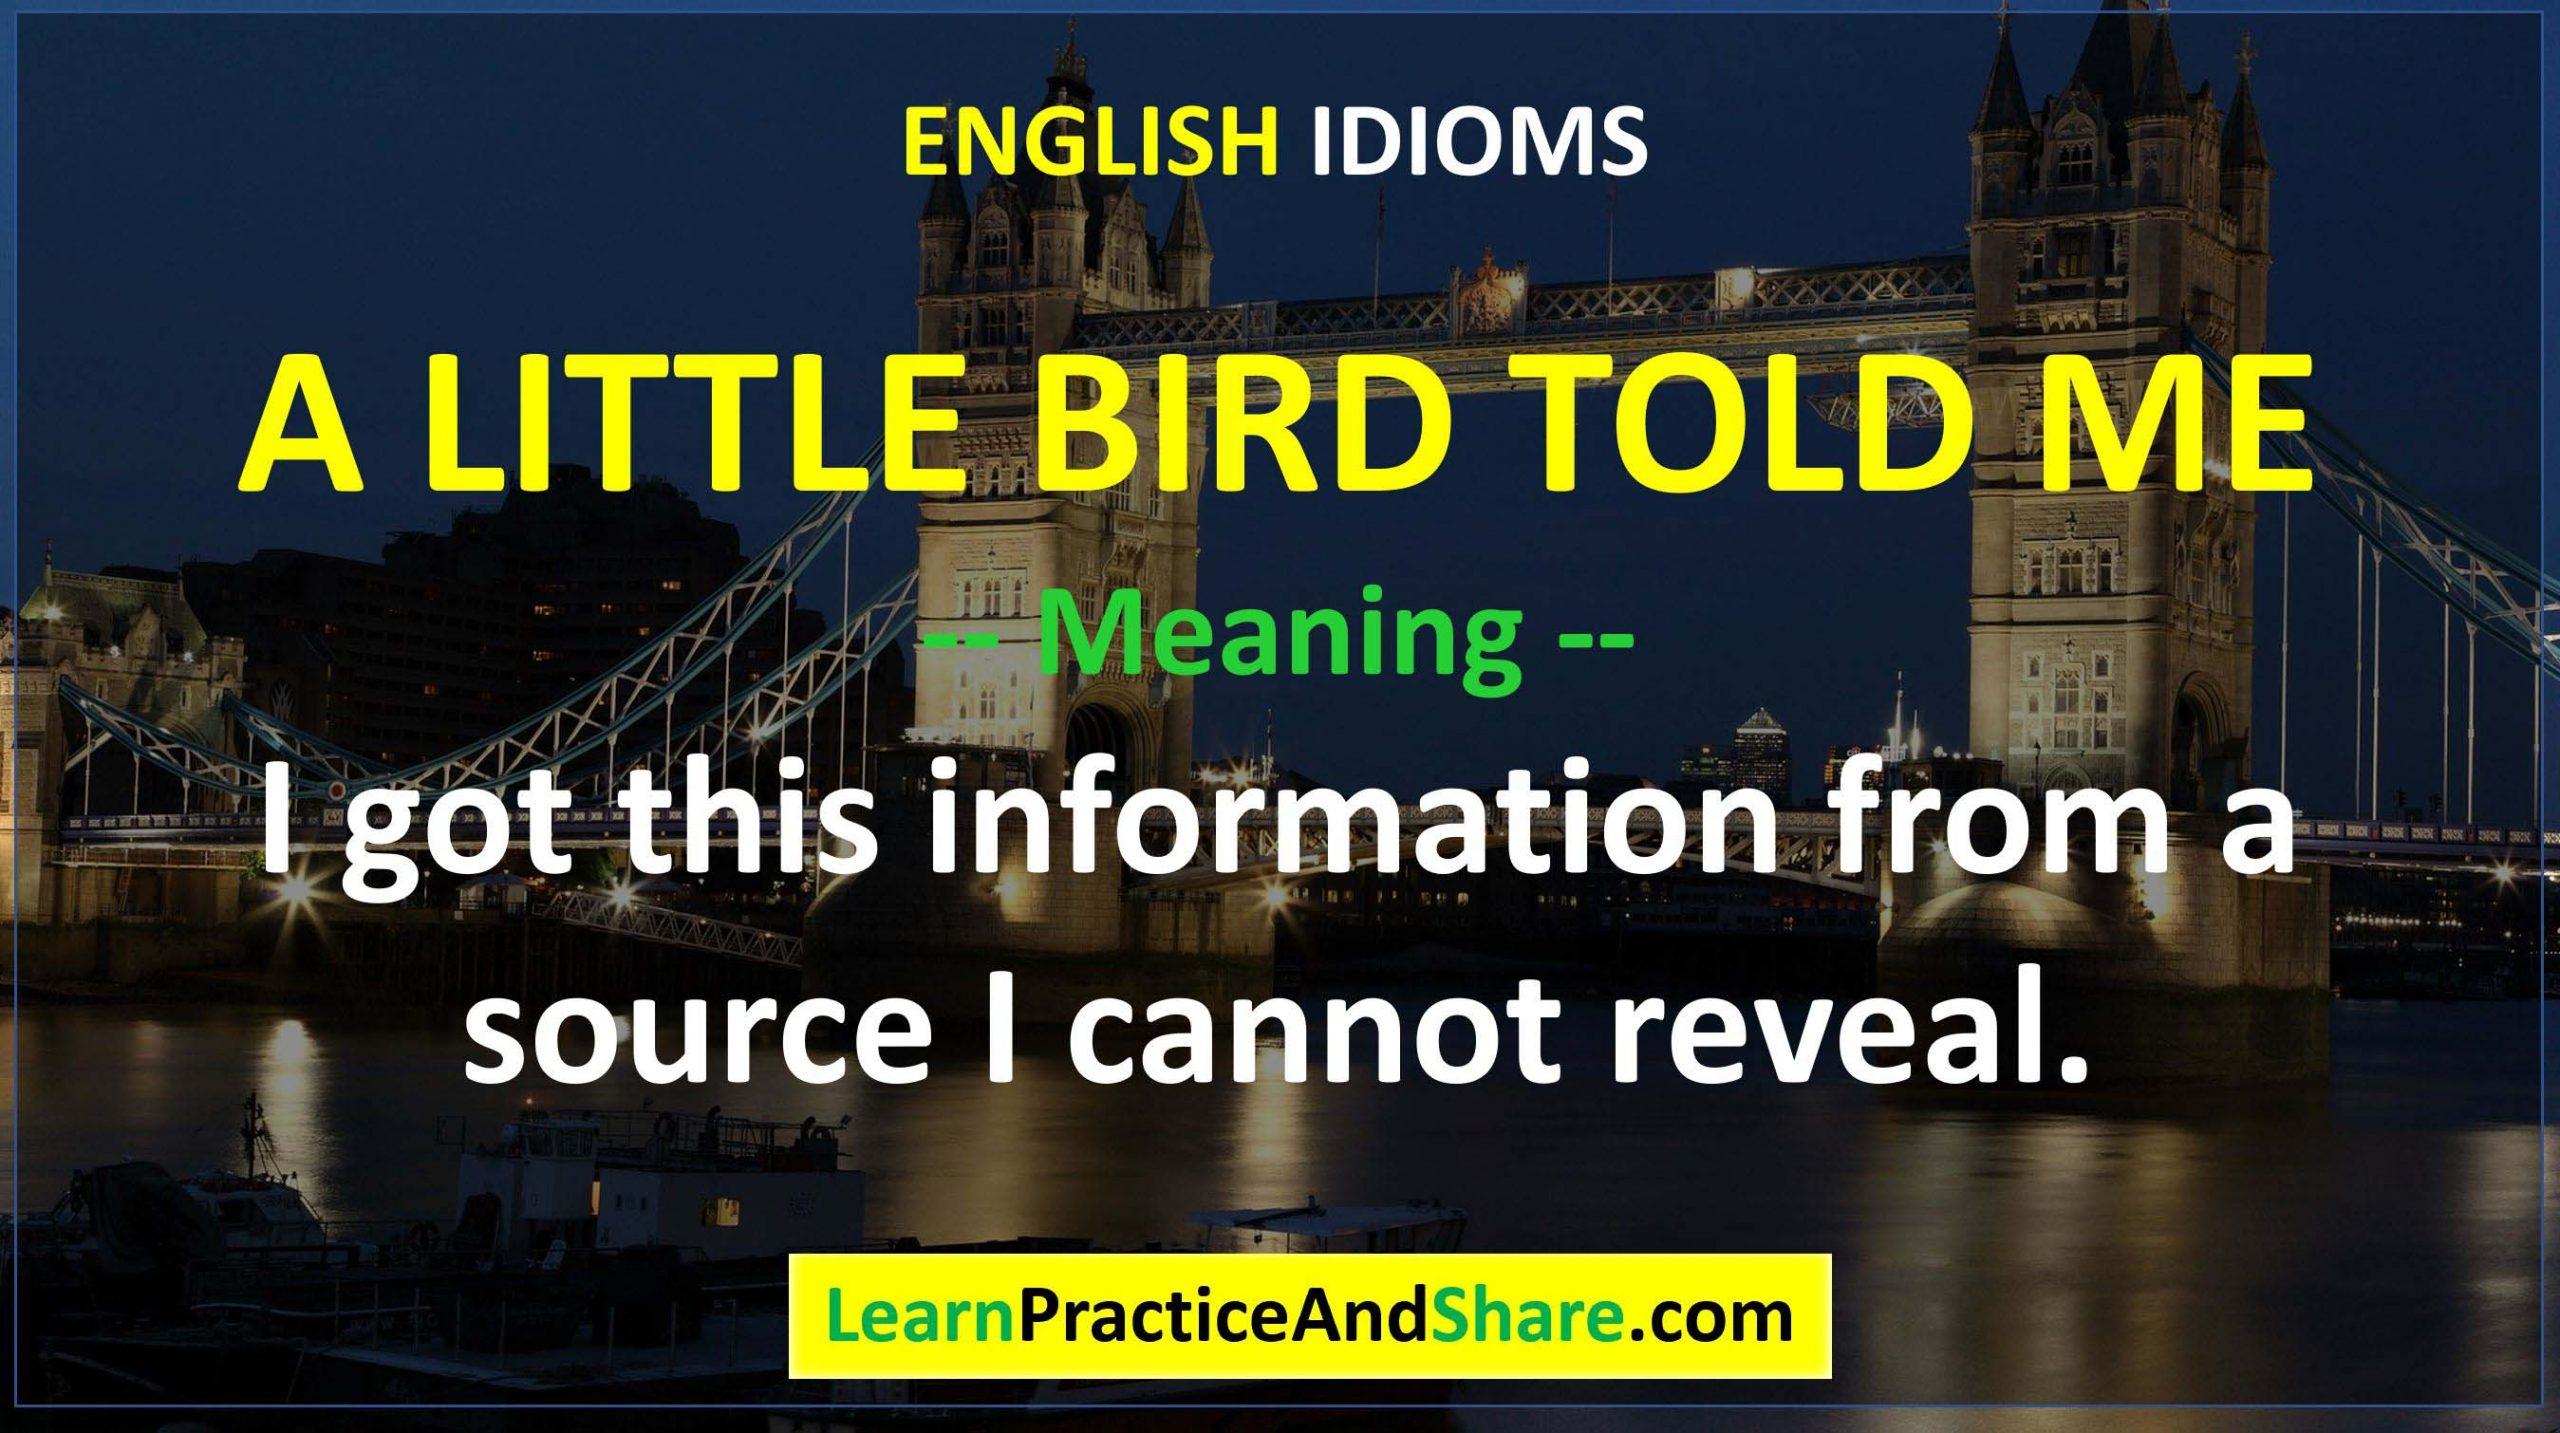 English Idiom - A Little Bird Told Me